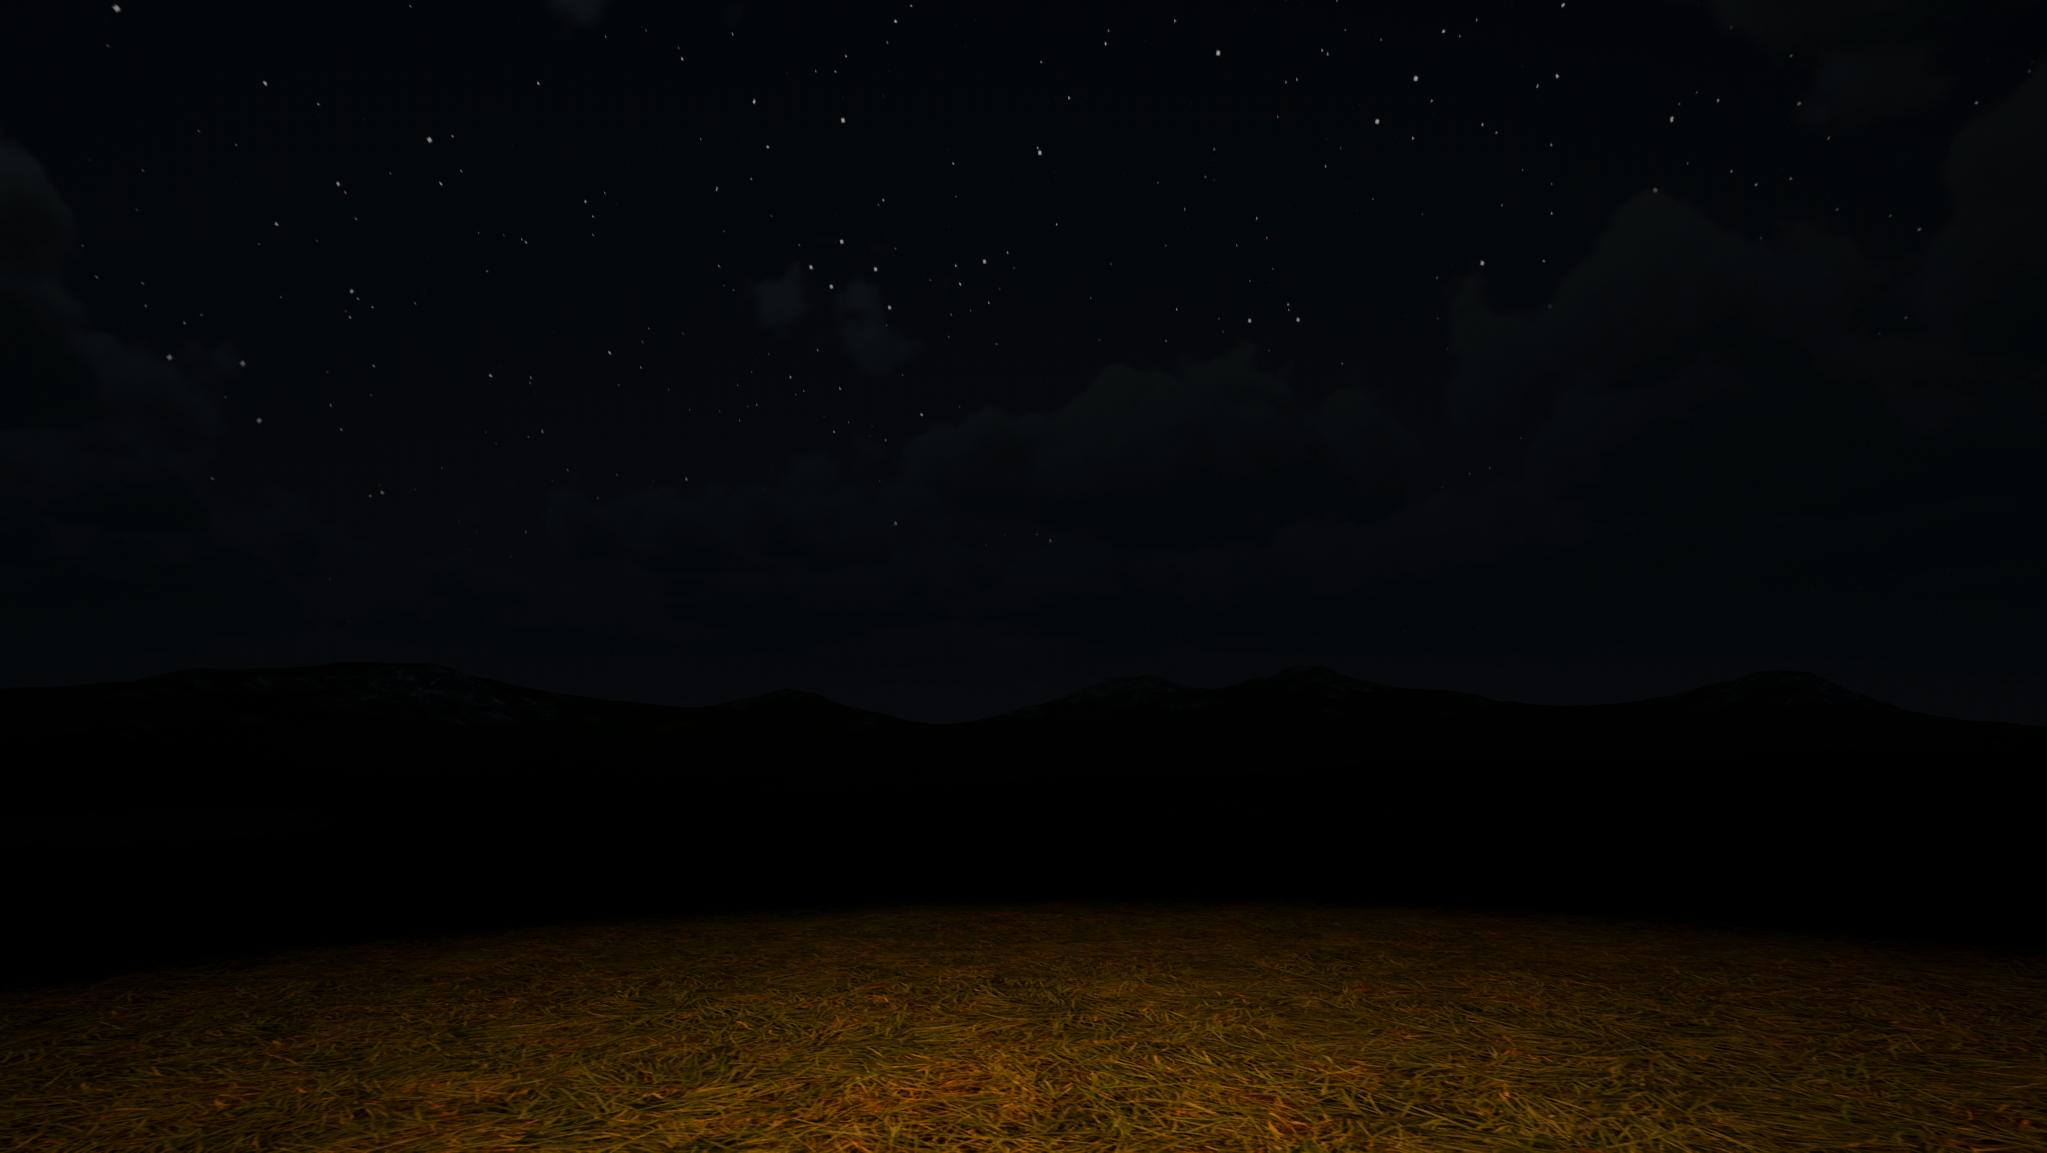 DarkNights.png